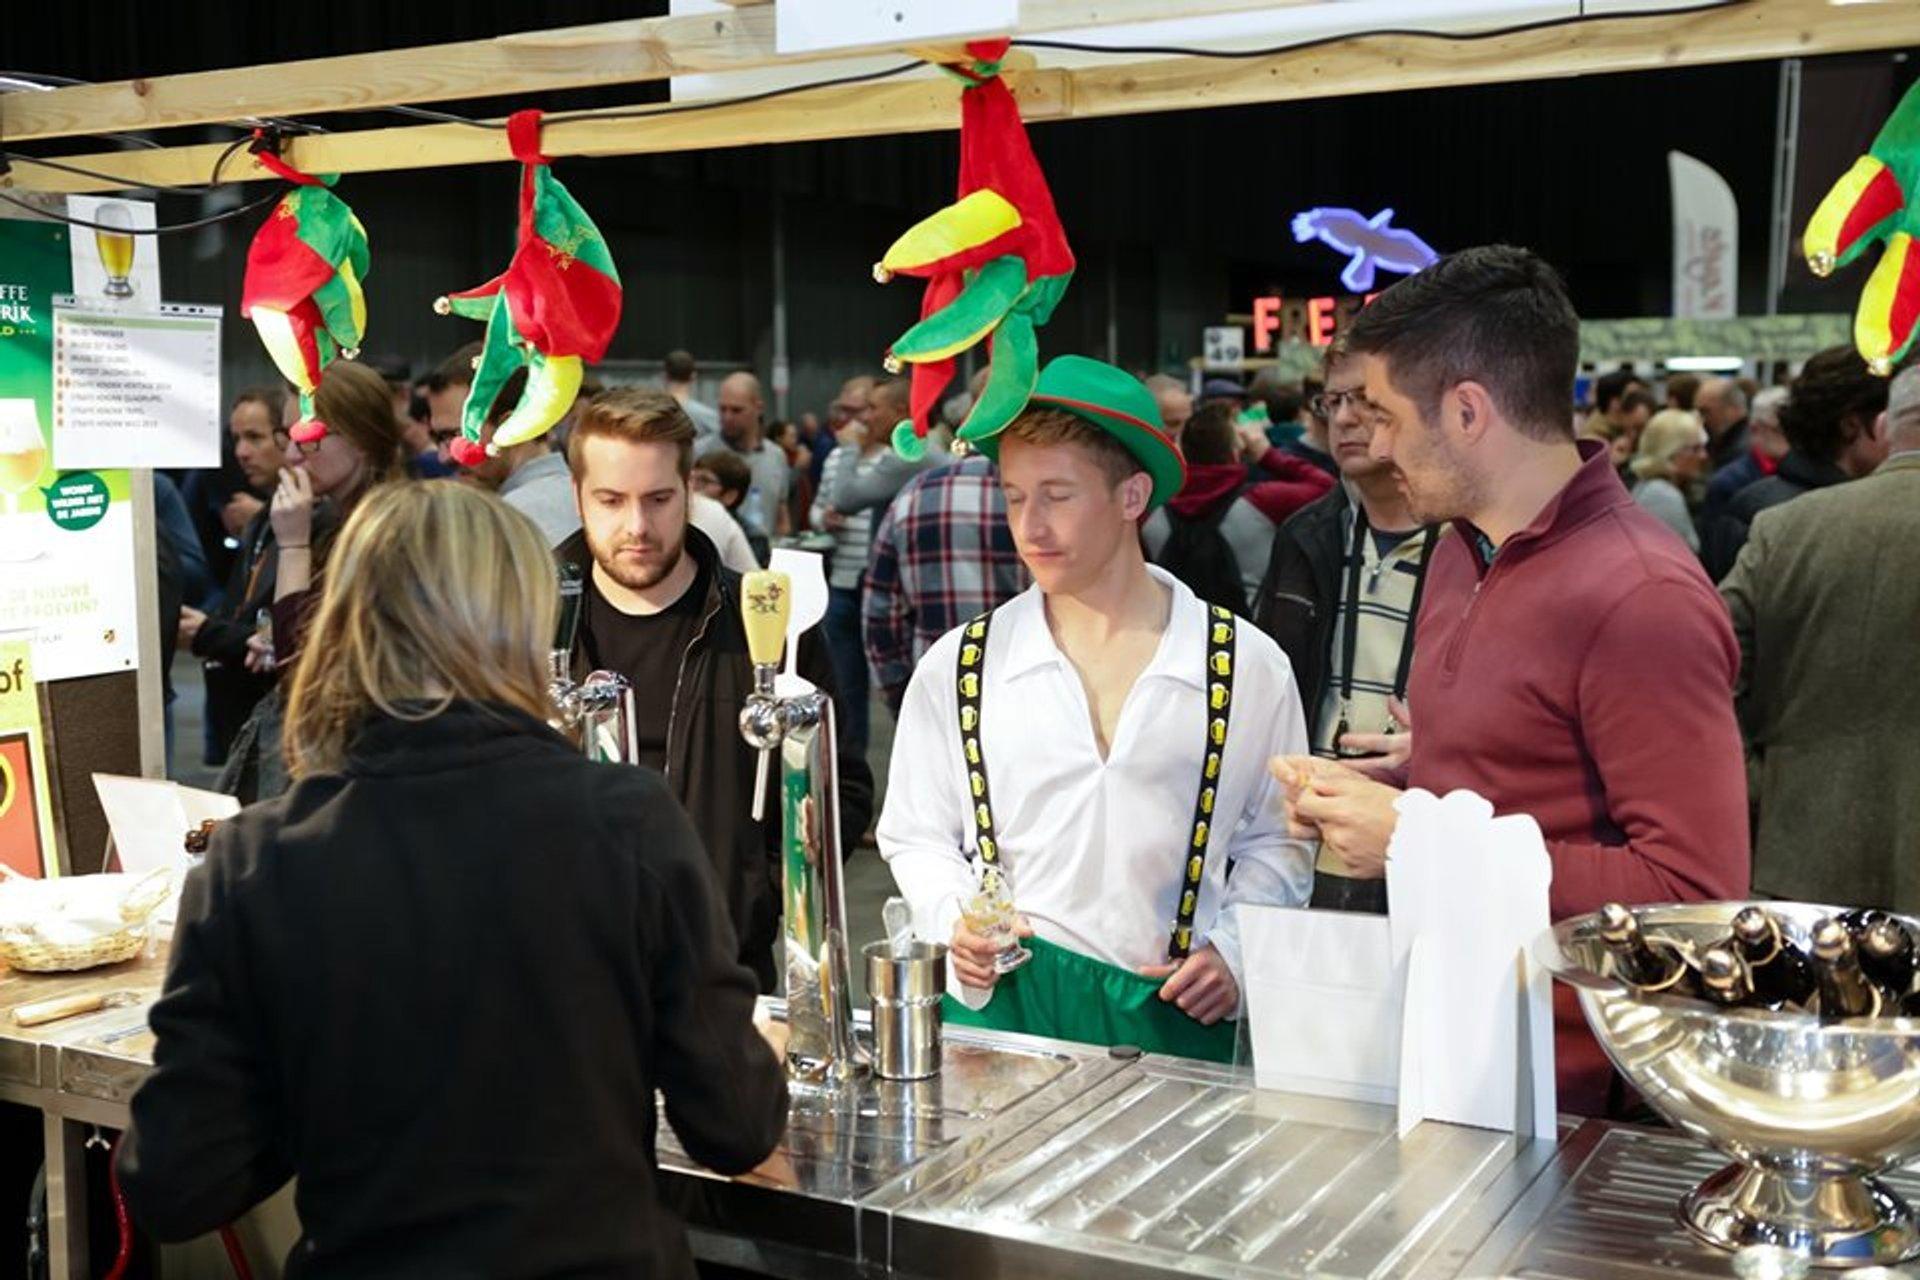 Best time for Zythos Beer Festival 2020